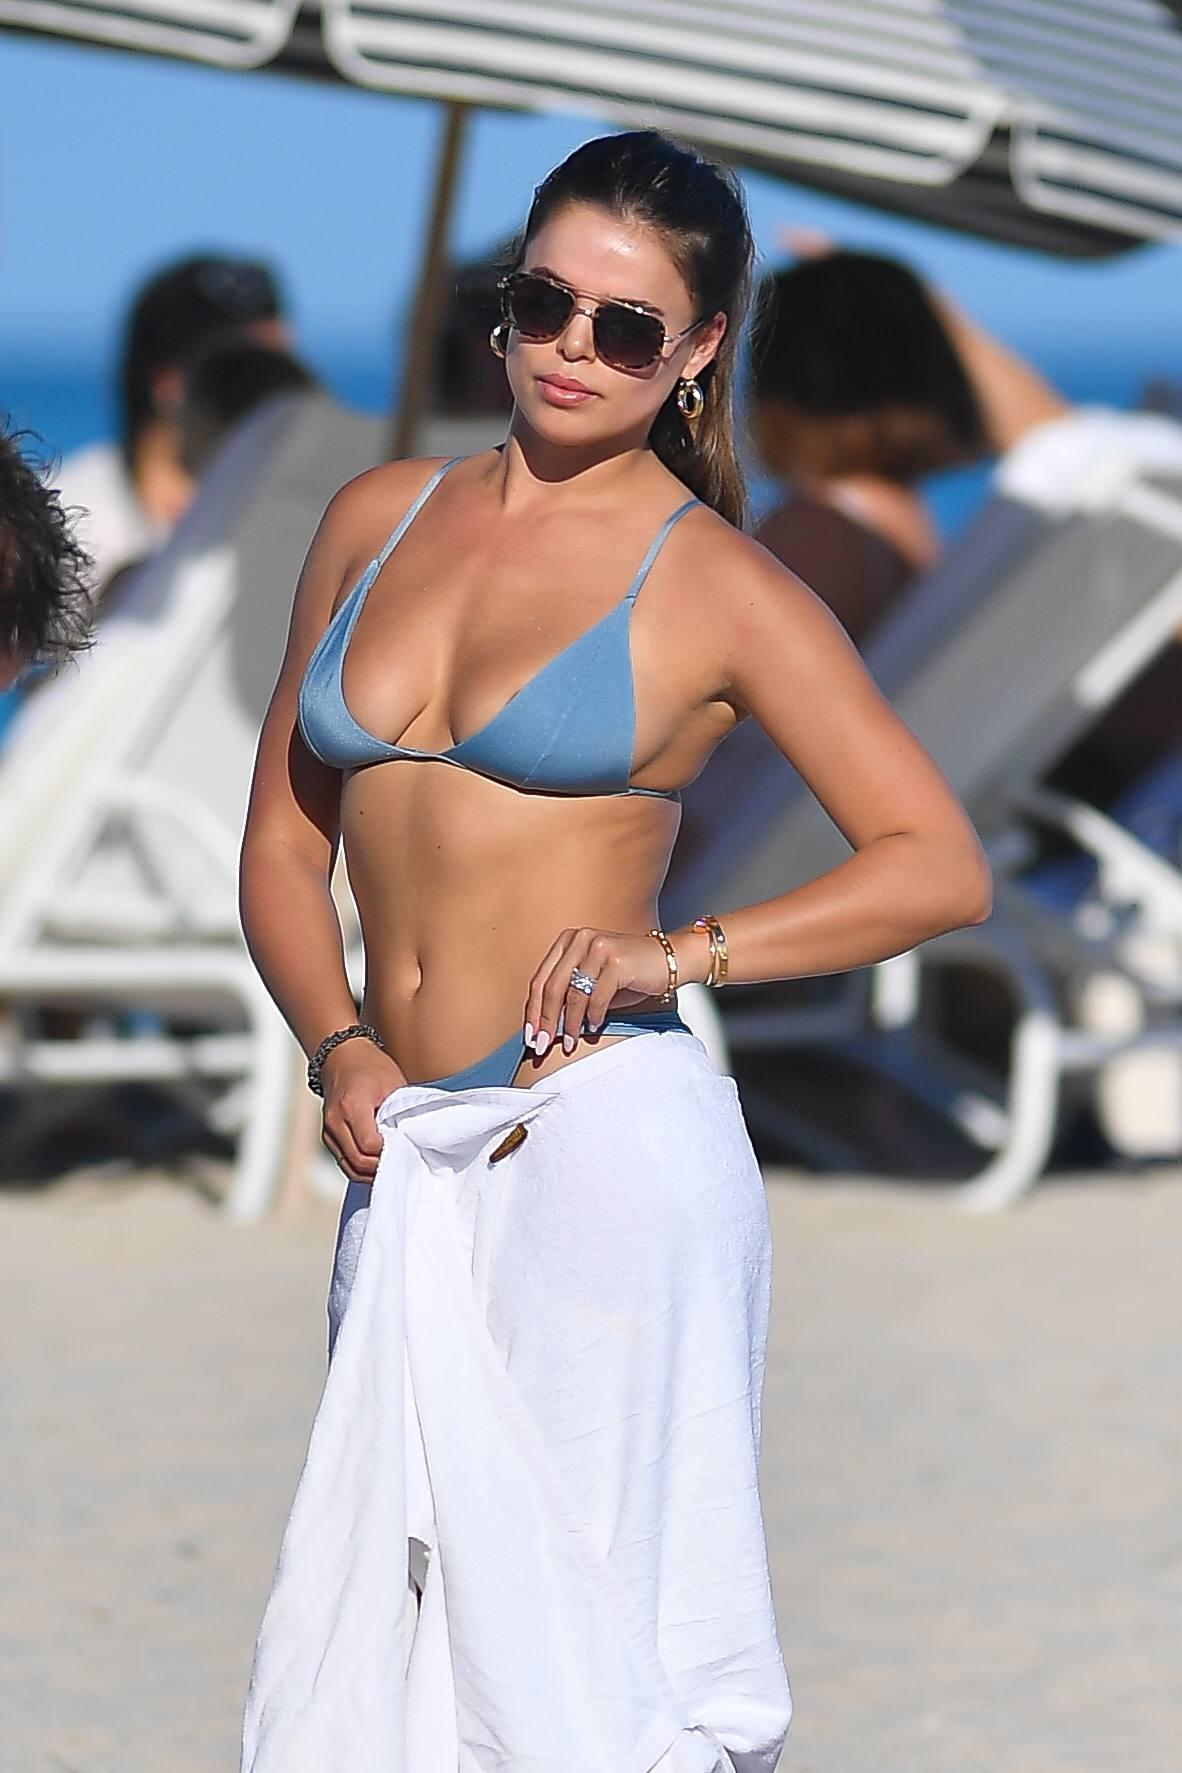 Brooks Nader Sexy In Bikini